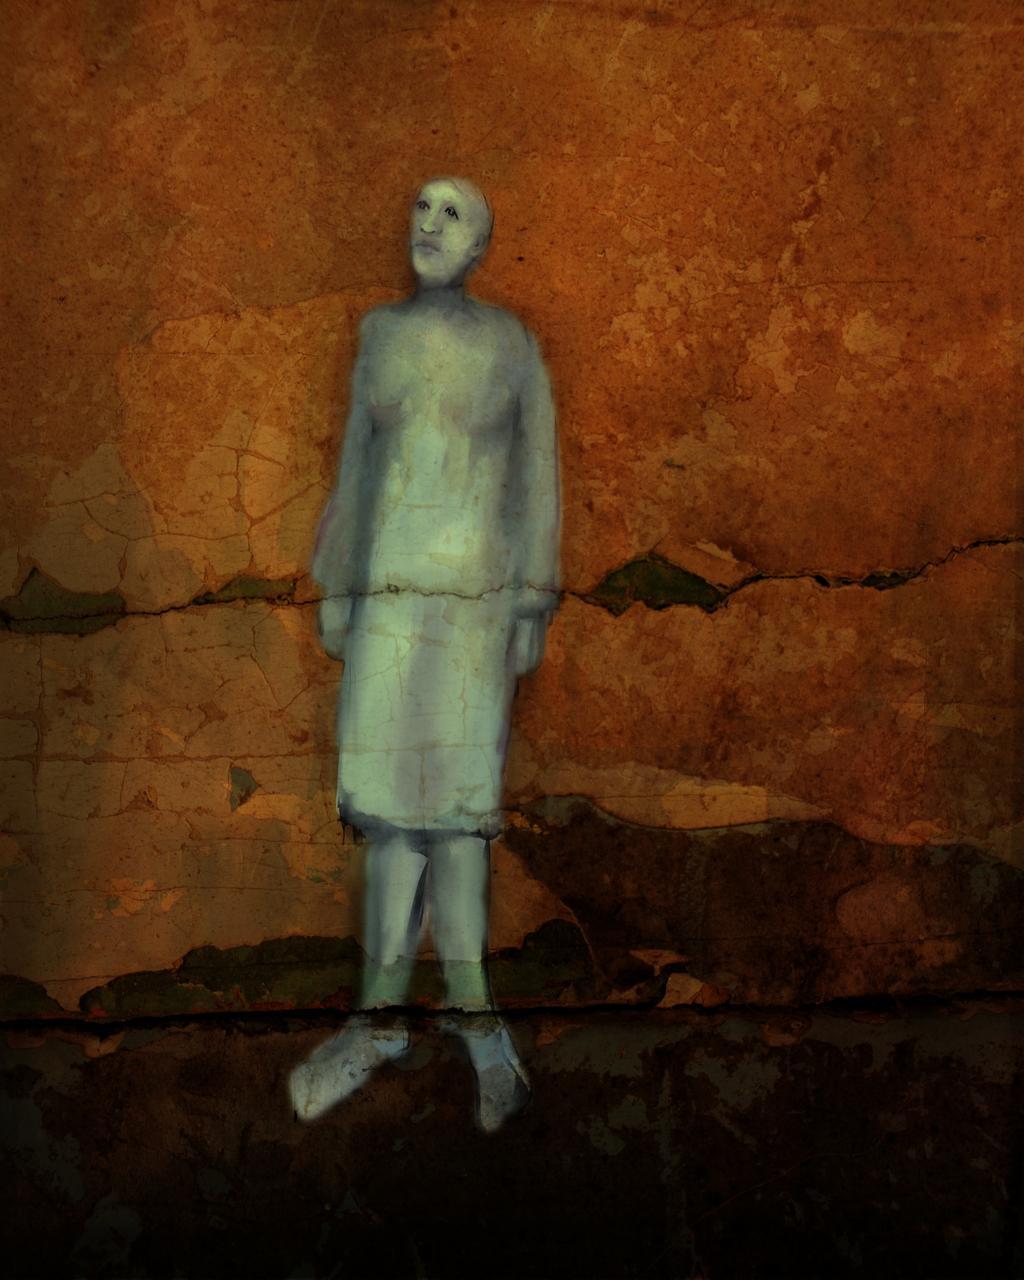 Twelve: Digital painting by Marina Flournoy